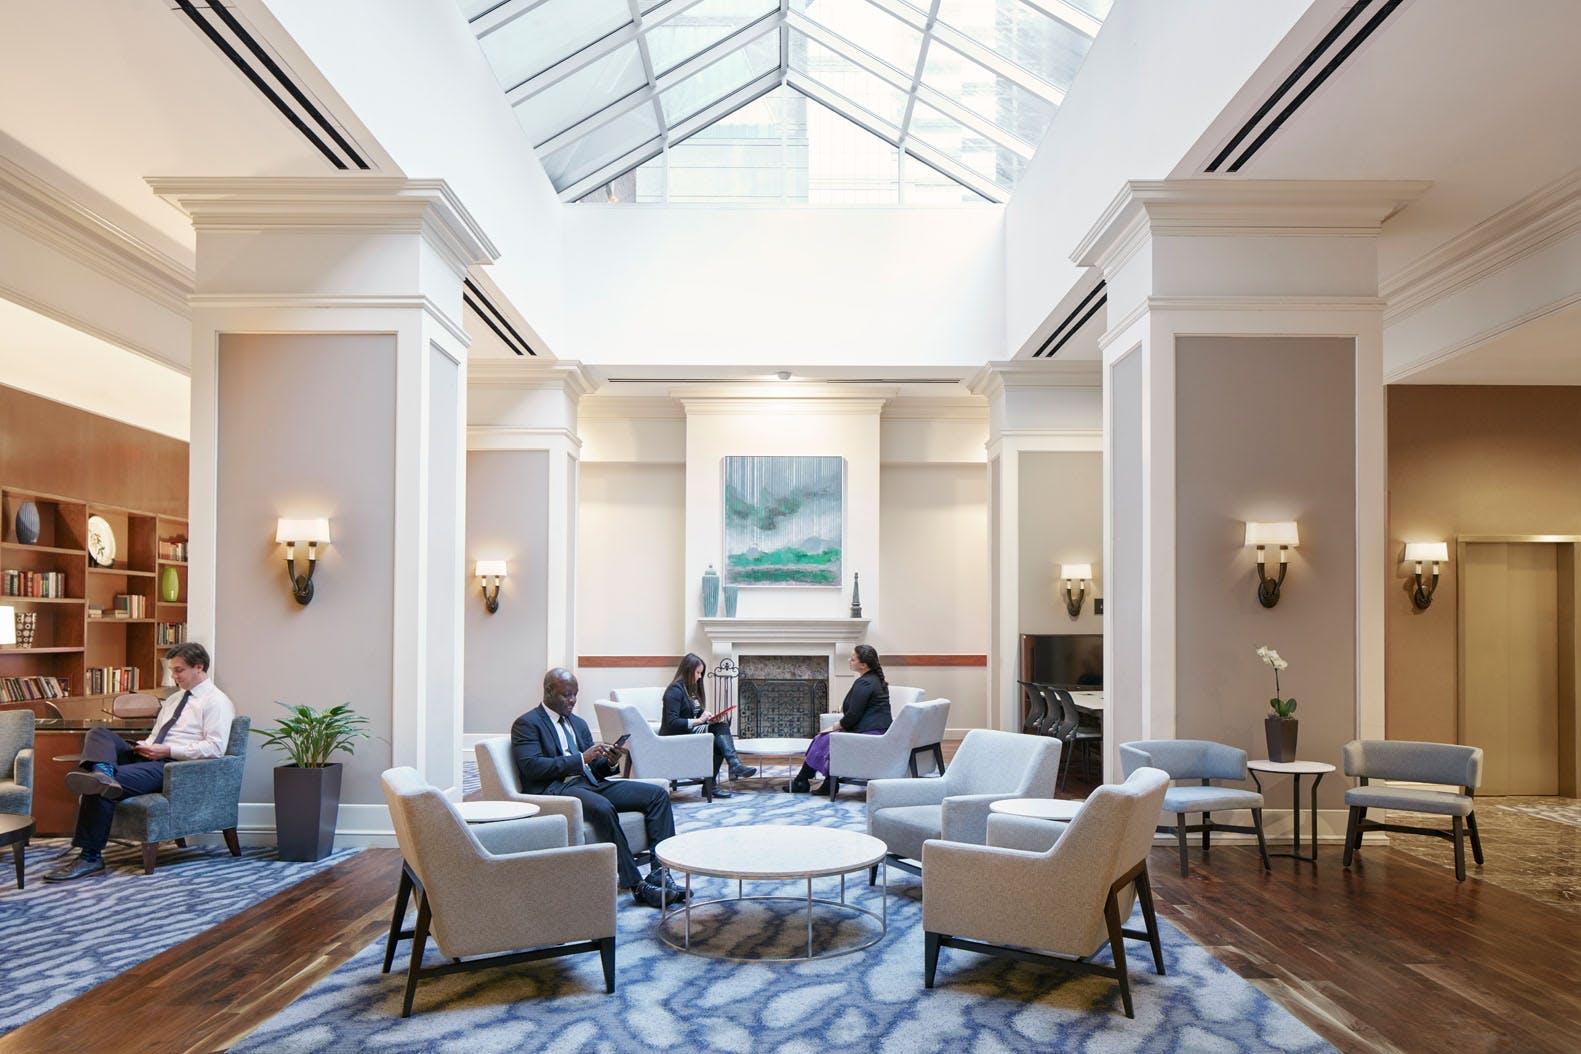 Club Living Room at Club Quarters Hotel in Philadelphia